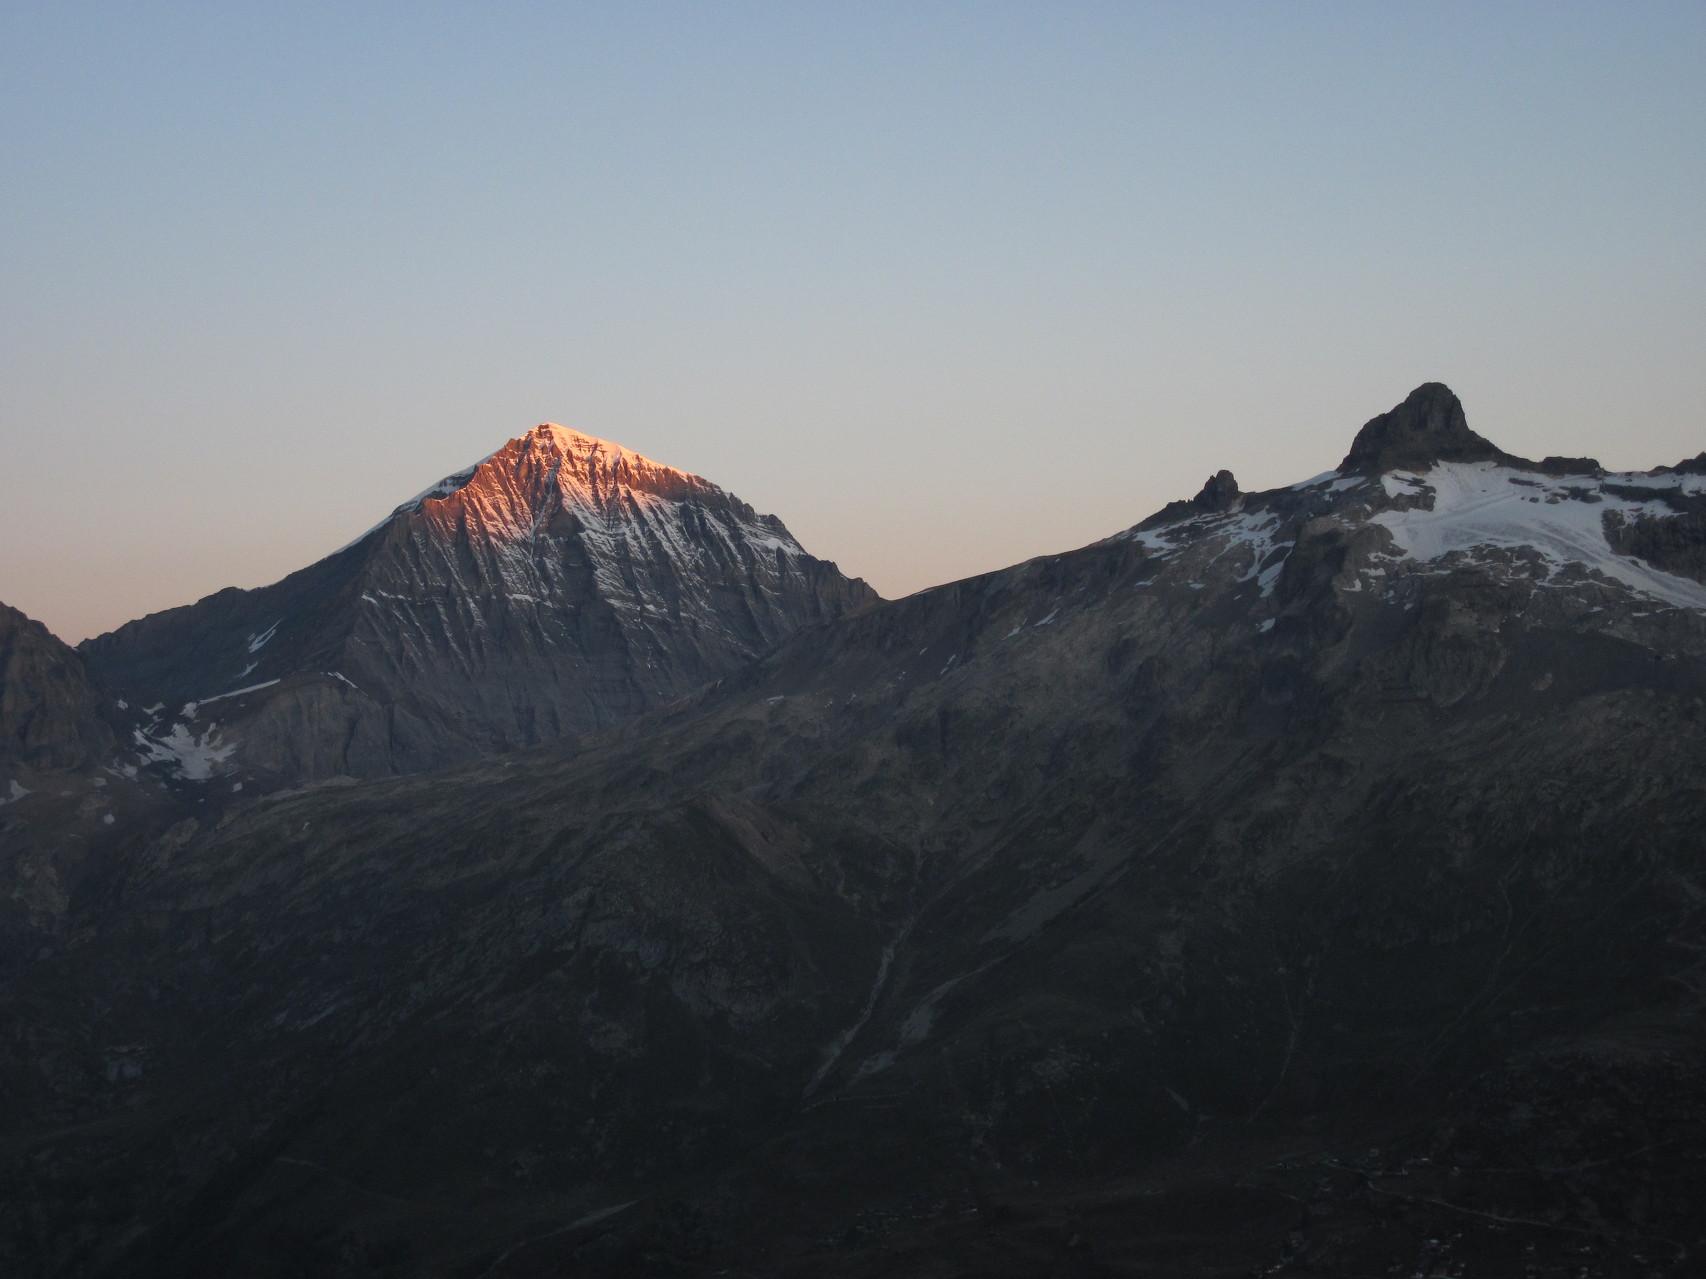 Sonnenaufgang am Balmhorn